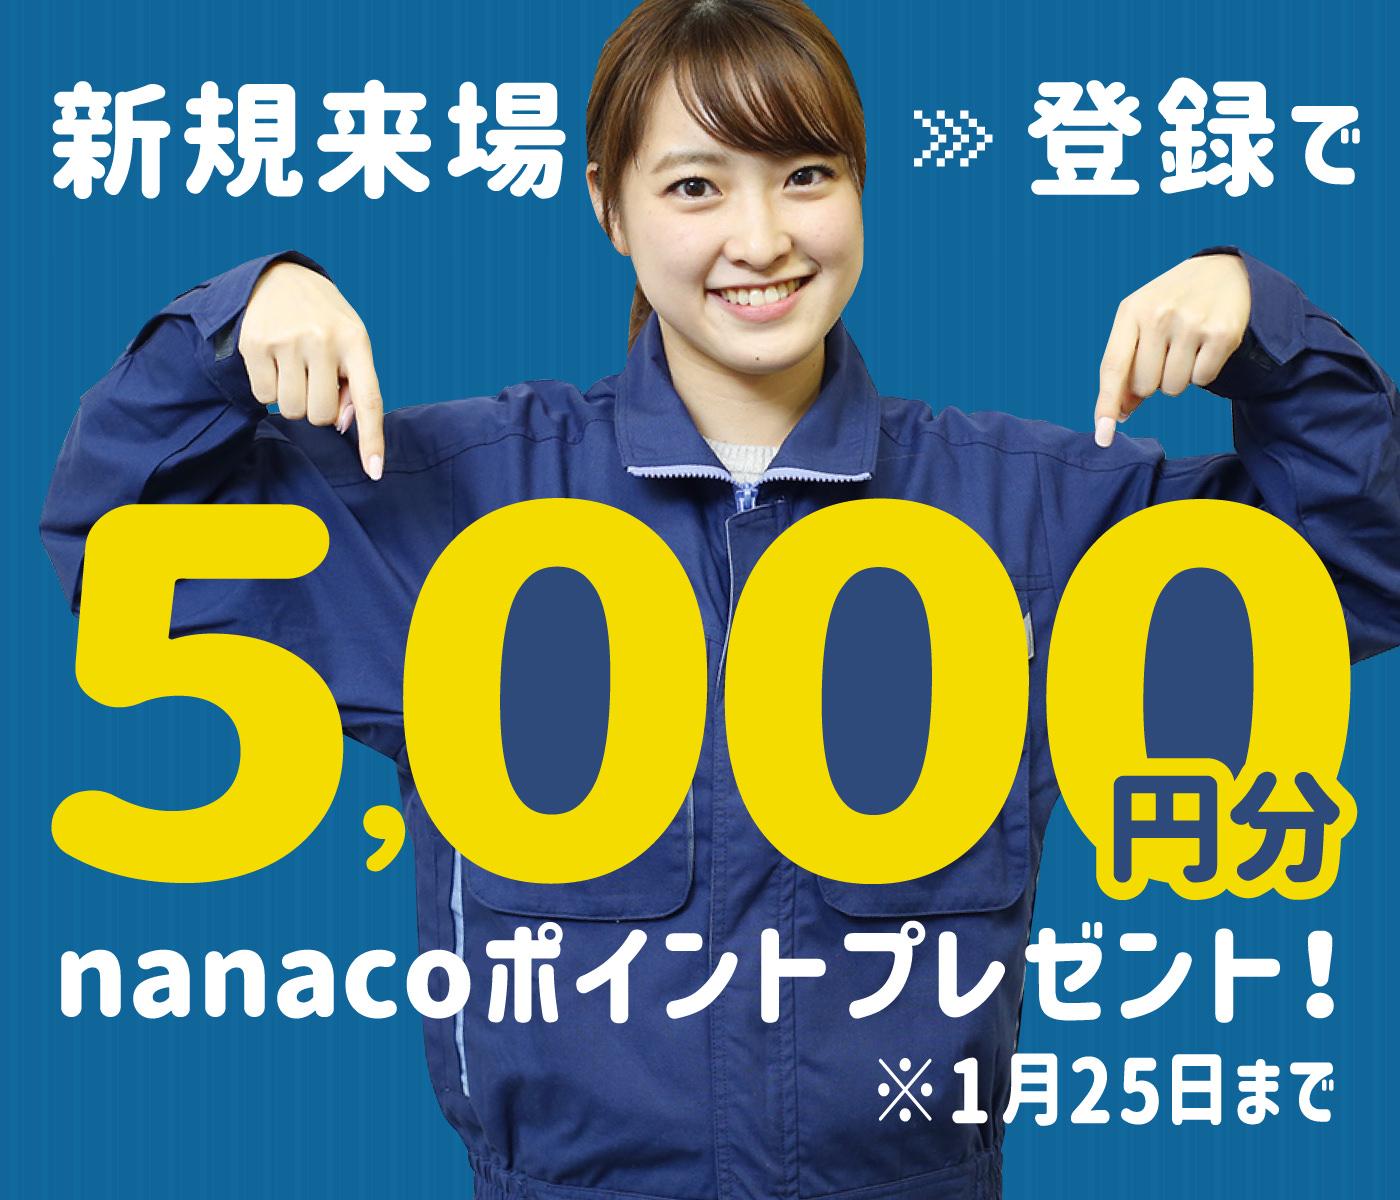 【浜松市西区】週払い可◆未経験OK!車通勤OK◆ごみ処理設備の運転維持管理